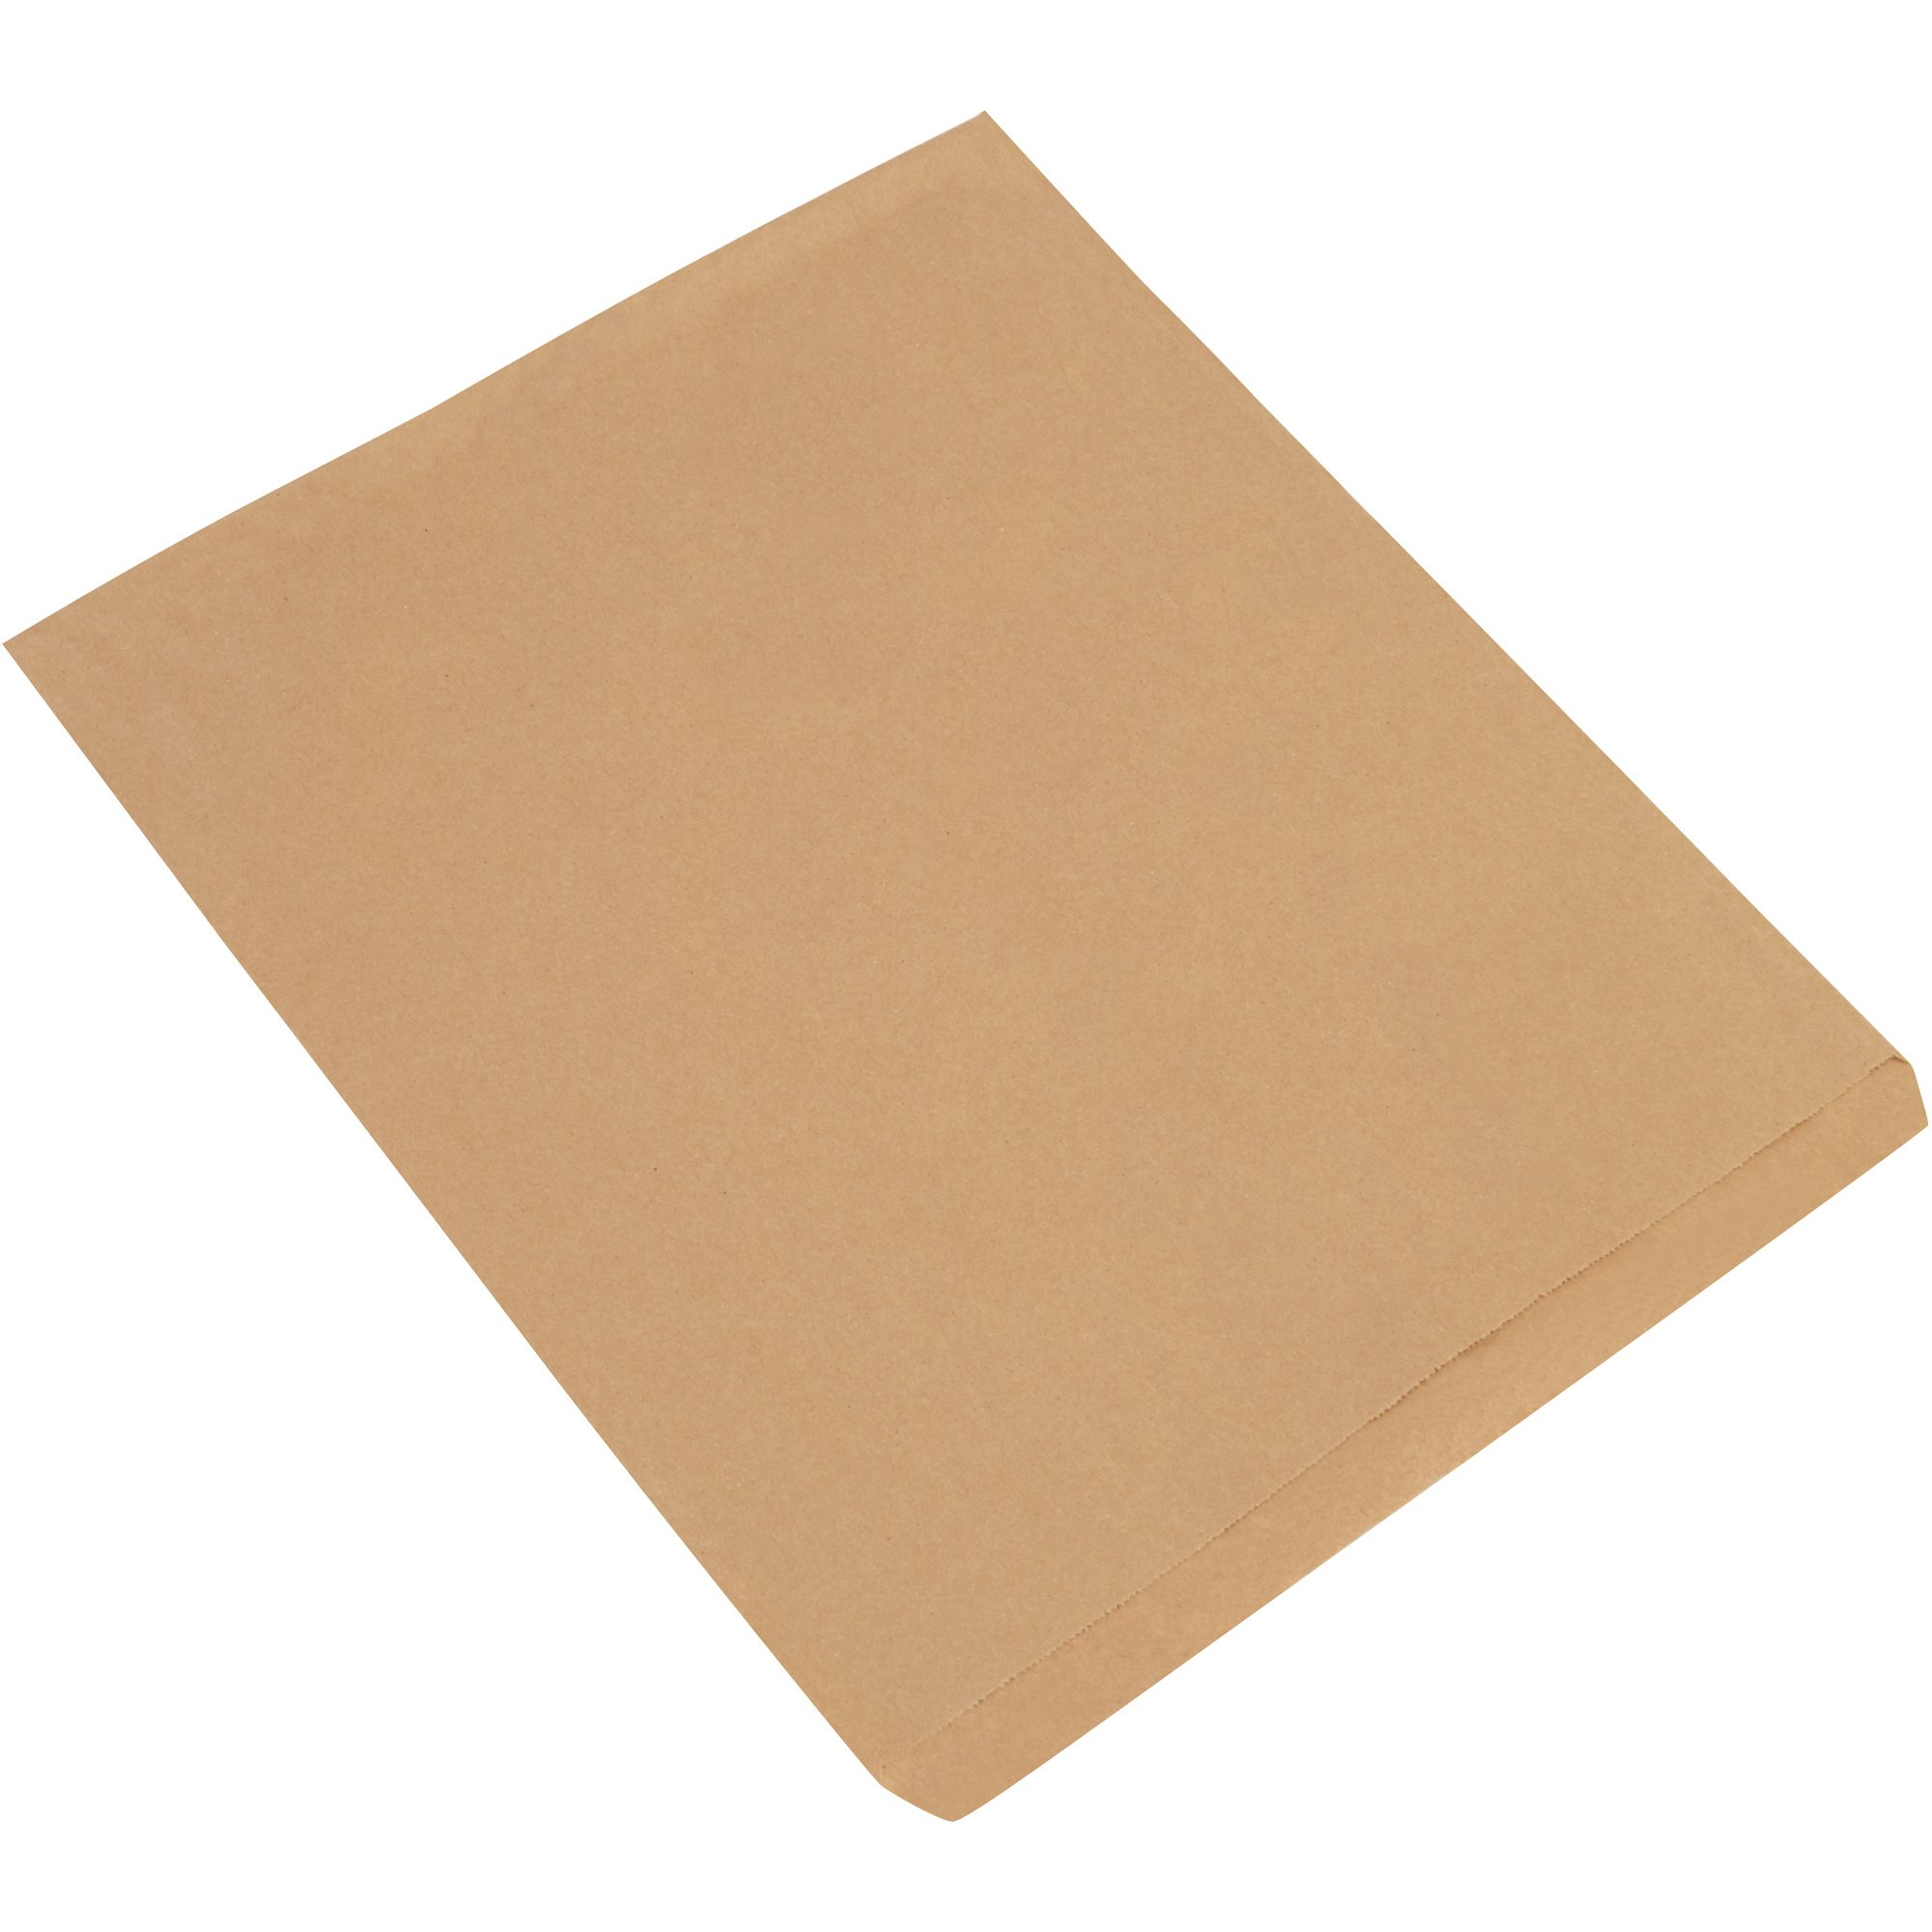 Flat Merchandise Bags, 15'' x 18'', Kraft, 500/Case